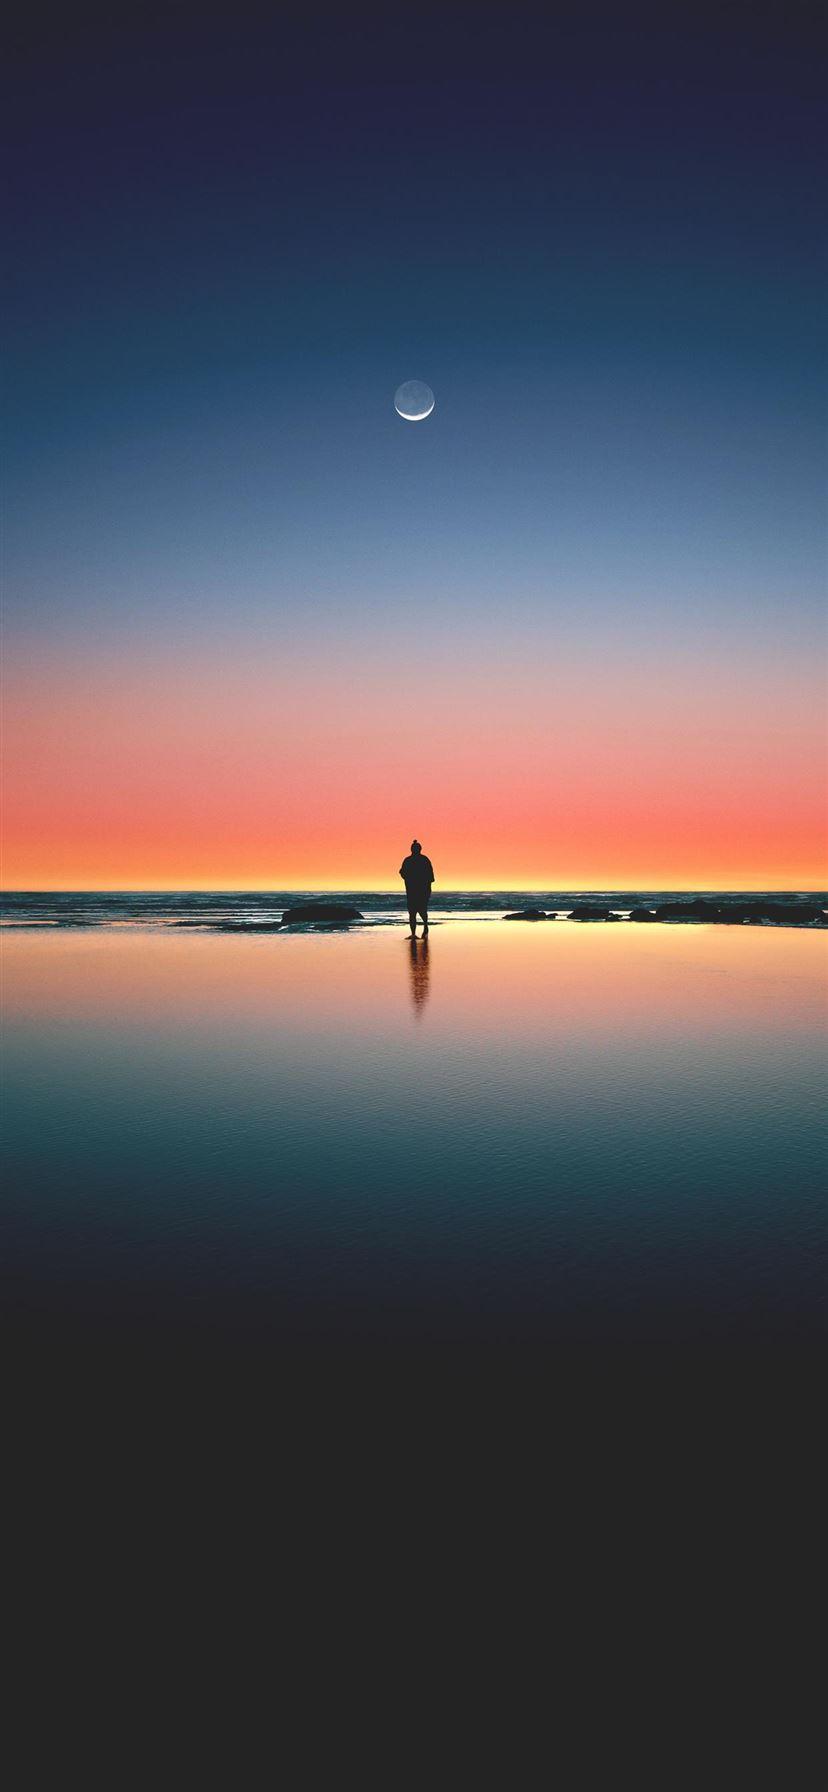 Best Sunset Iphone 11 Wallpapers Hd Ilikewallpaper